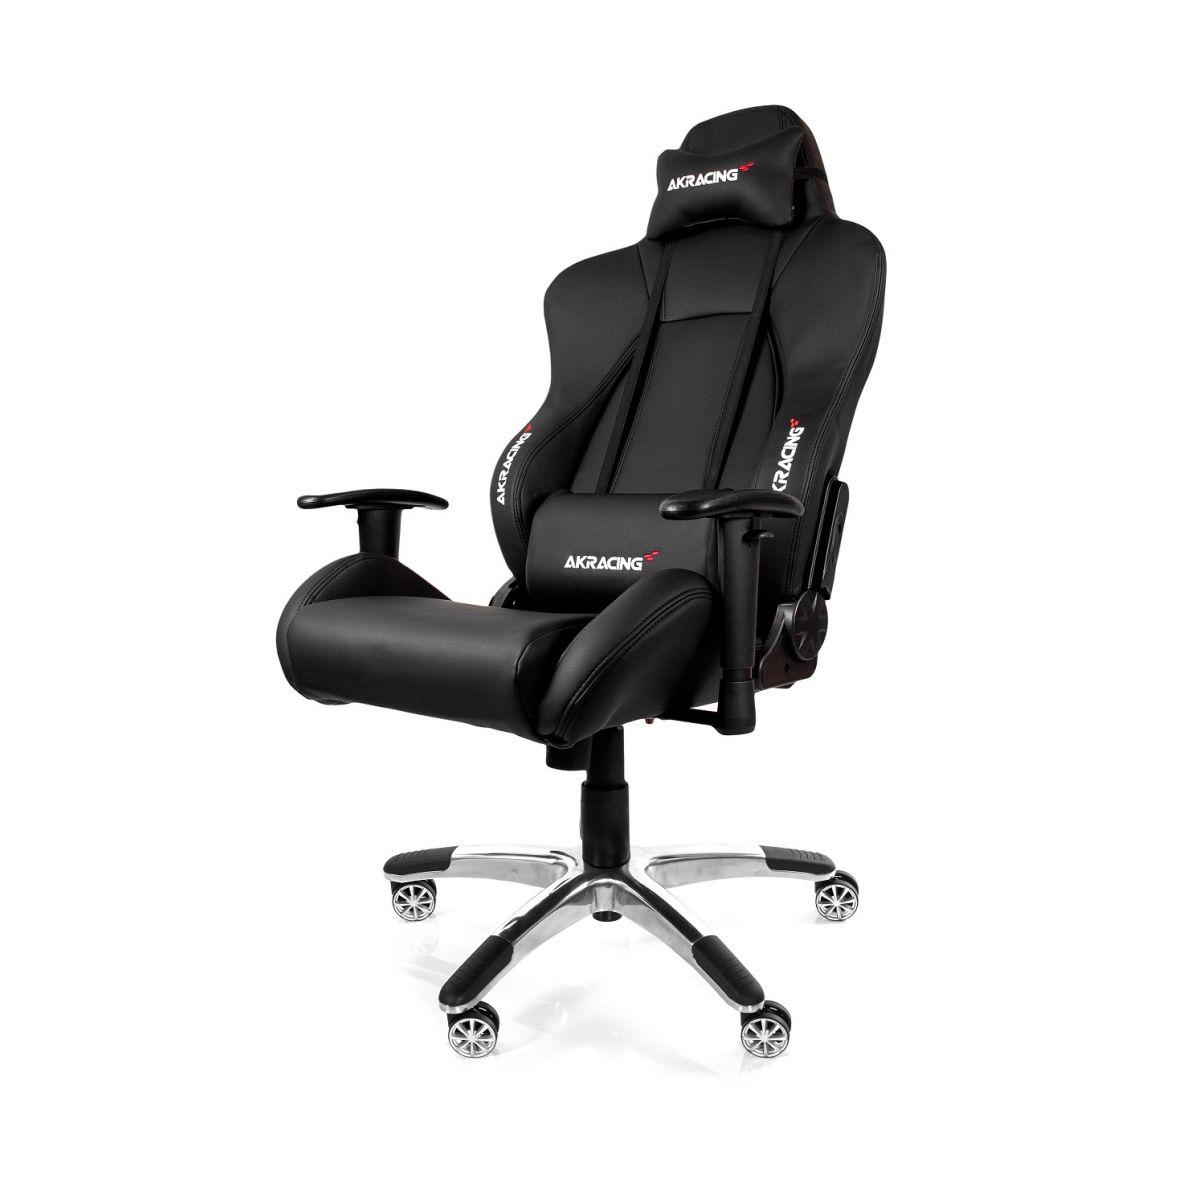 Cadeira AKracing Premium Black/Black V2 AK-7002-BB - AKracing